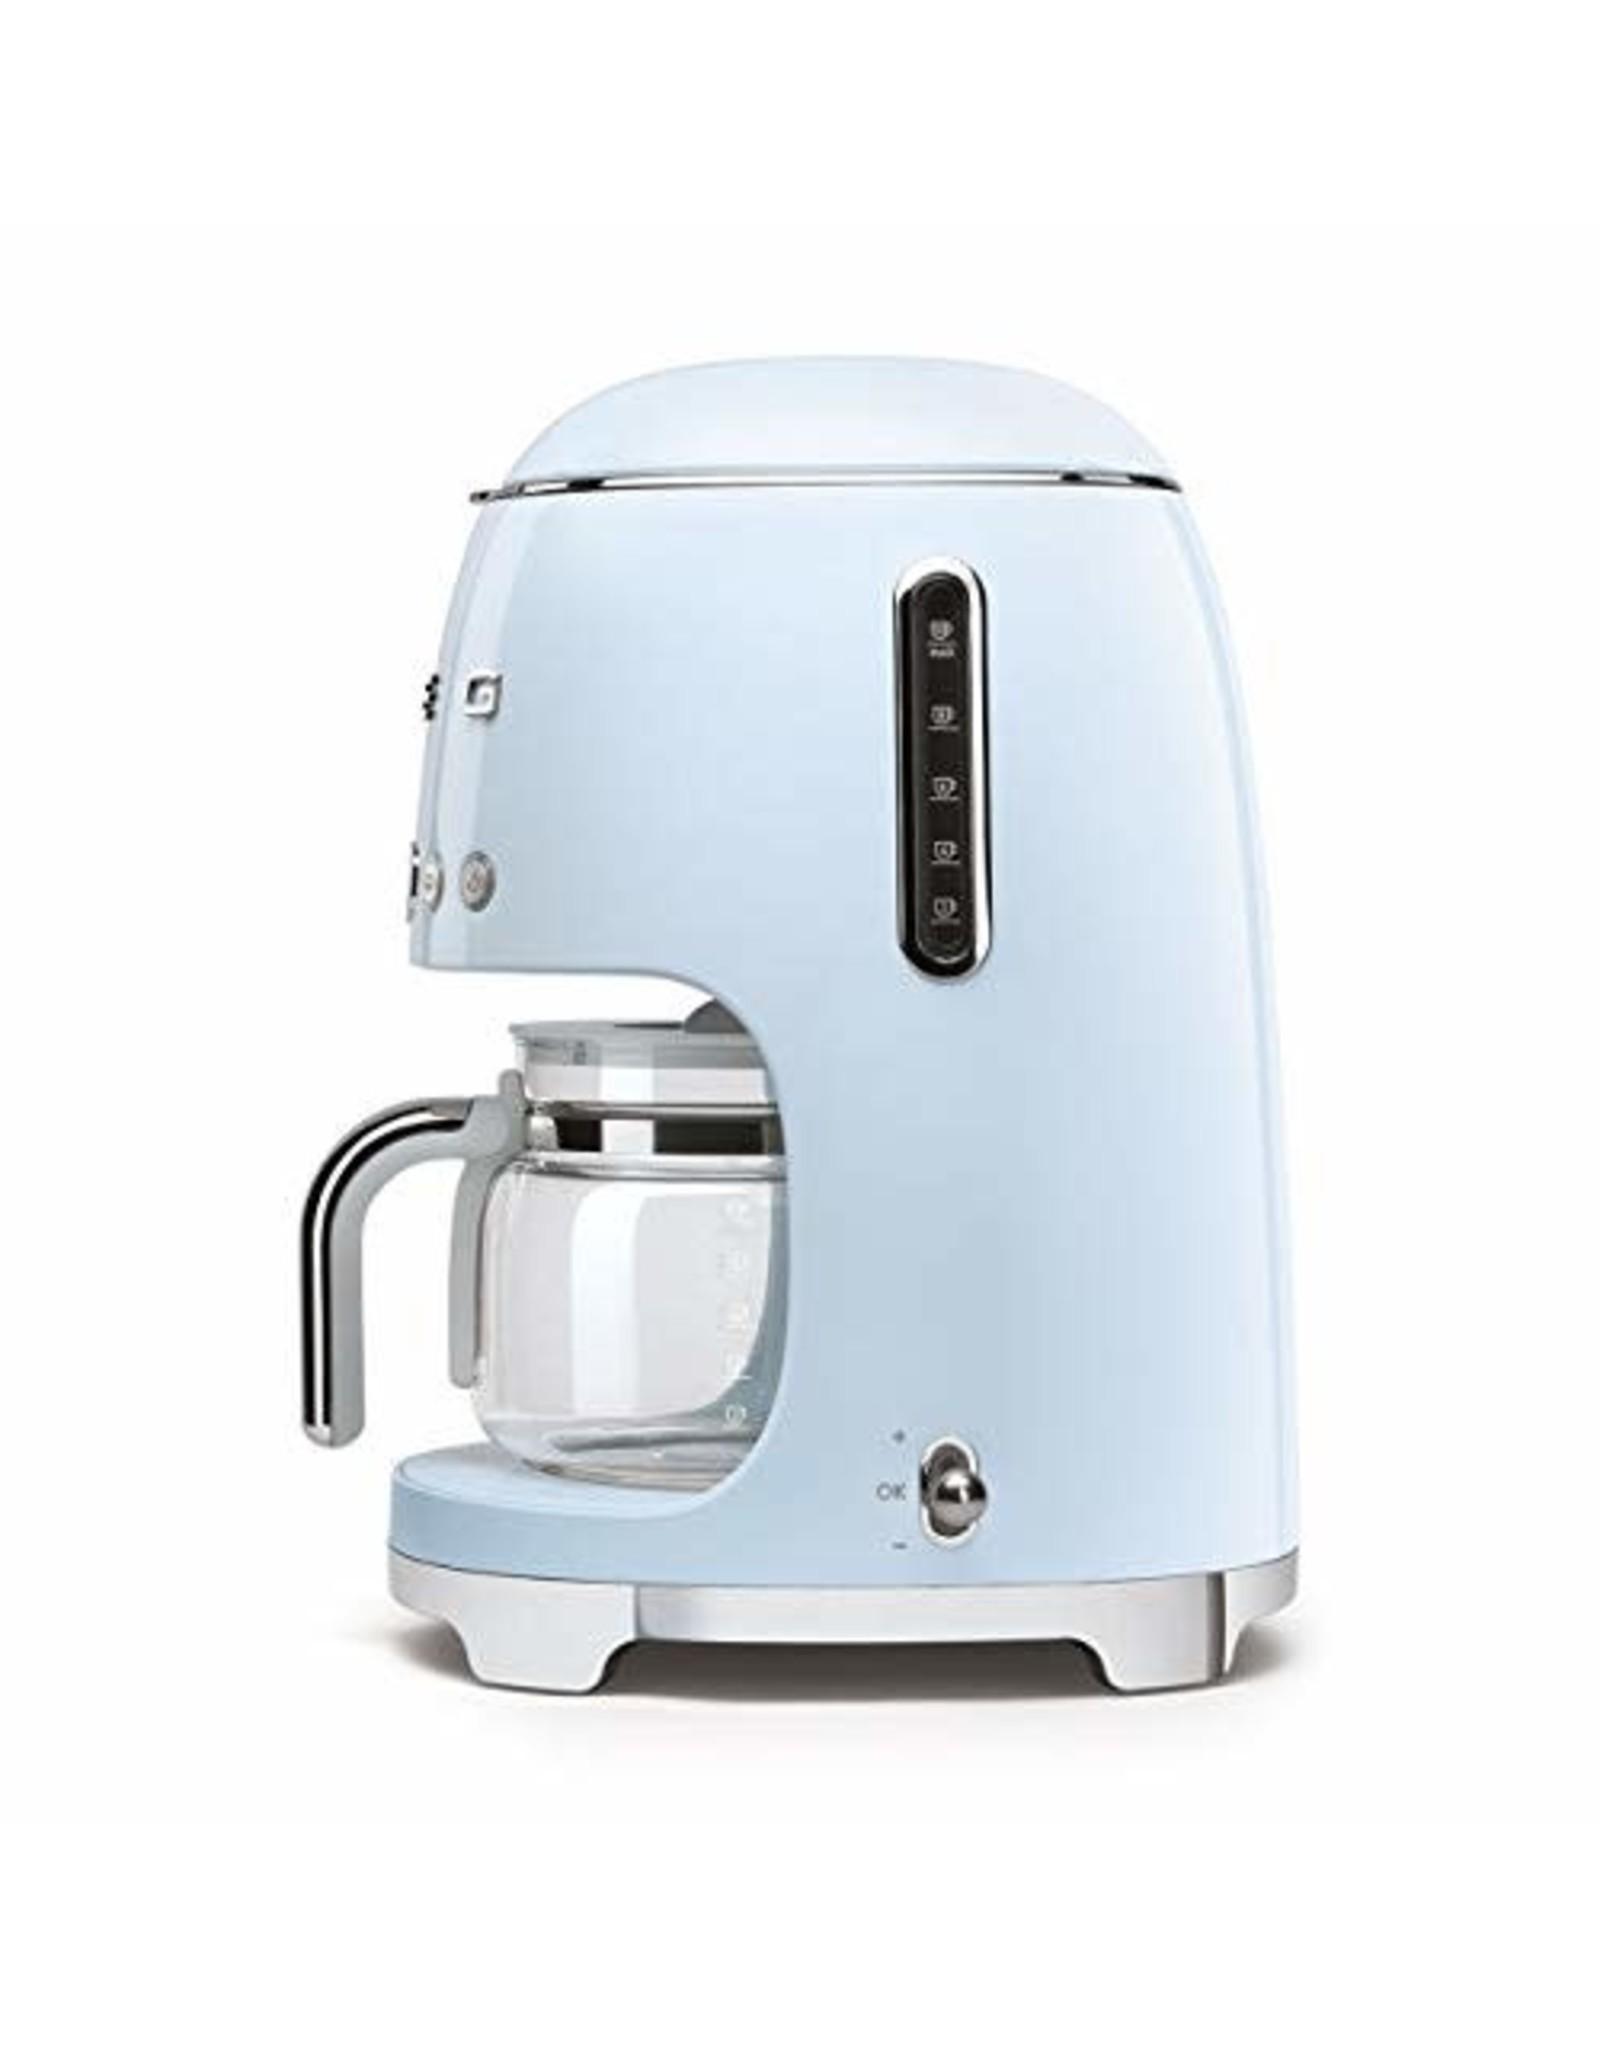 Smeg Smeg - Drip Coffee Maker - Pastel Blue